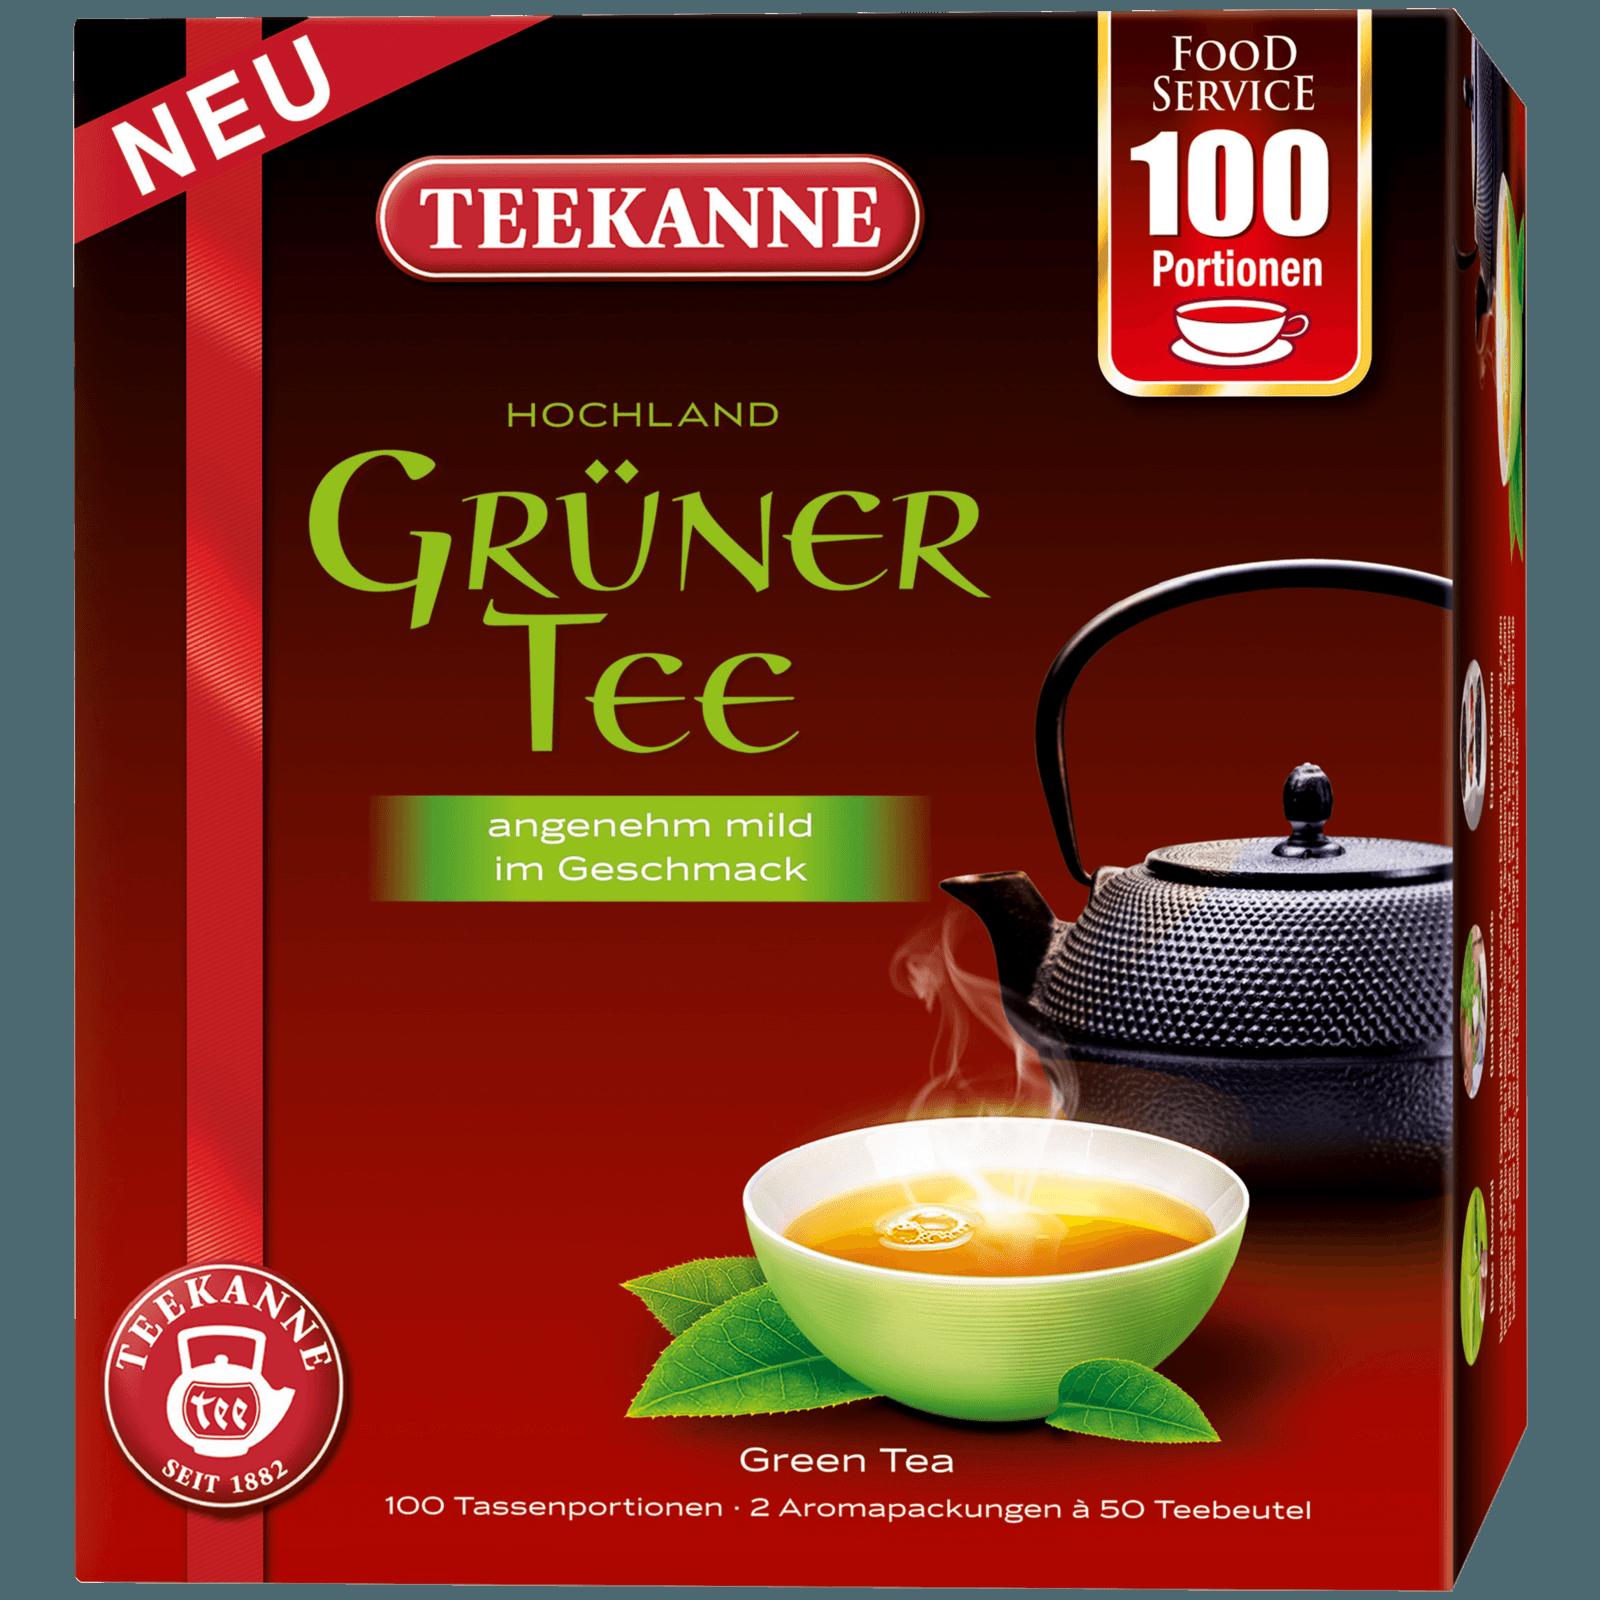 Teekanne Grüner Tee 150g, 100 Beutel